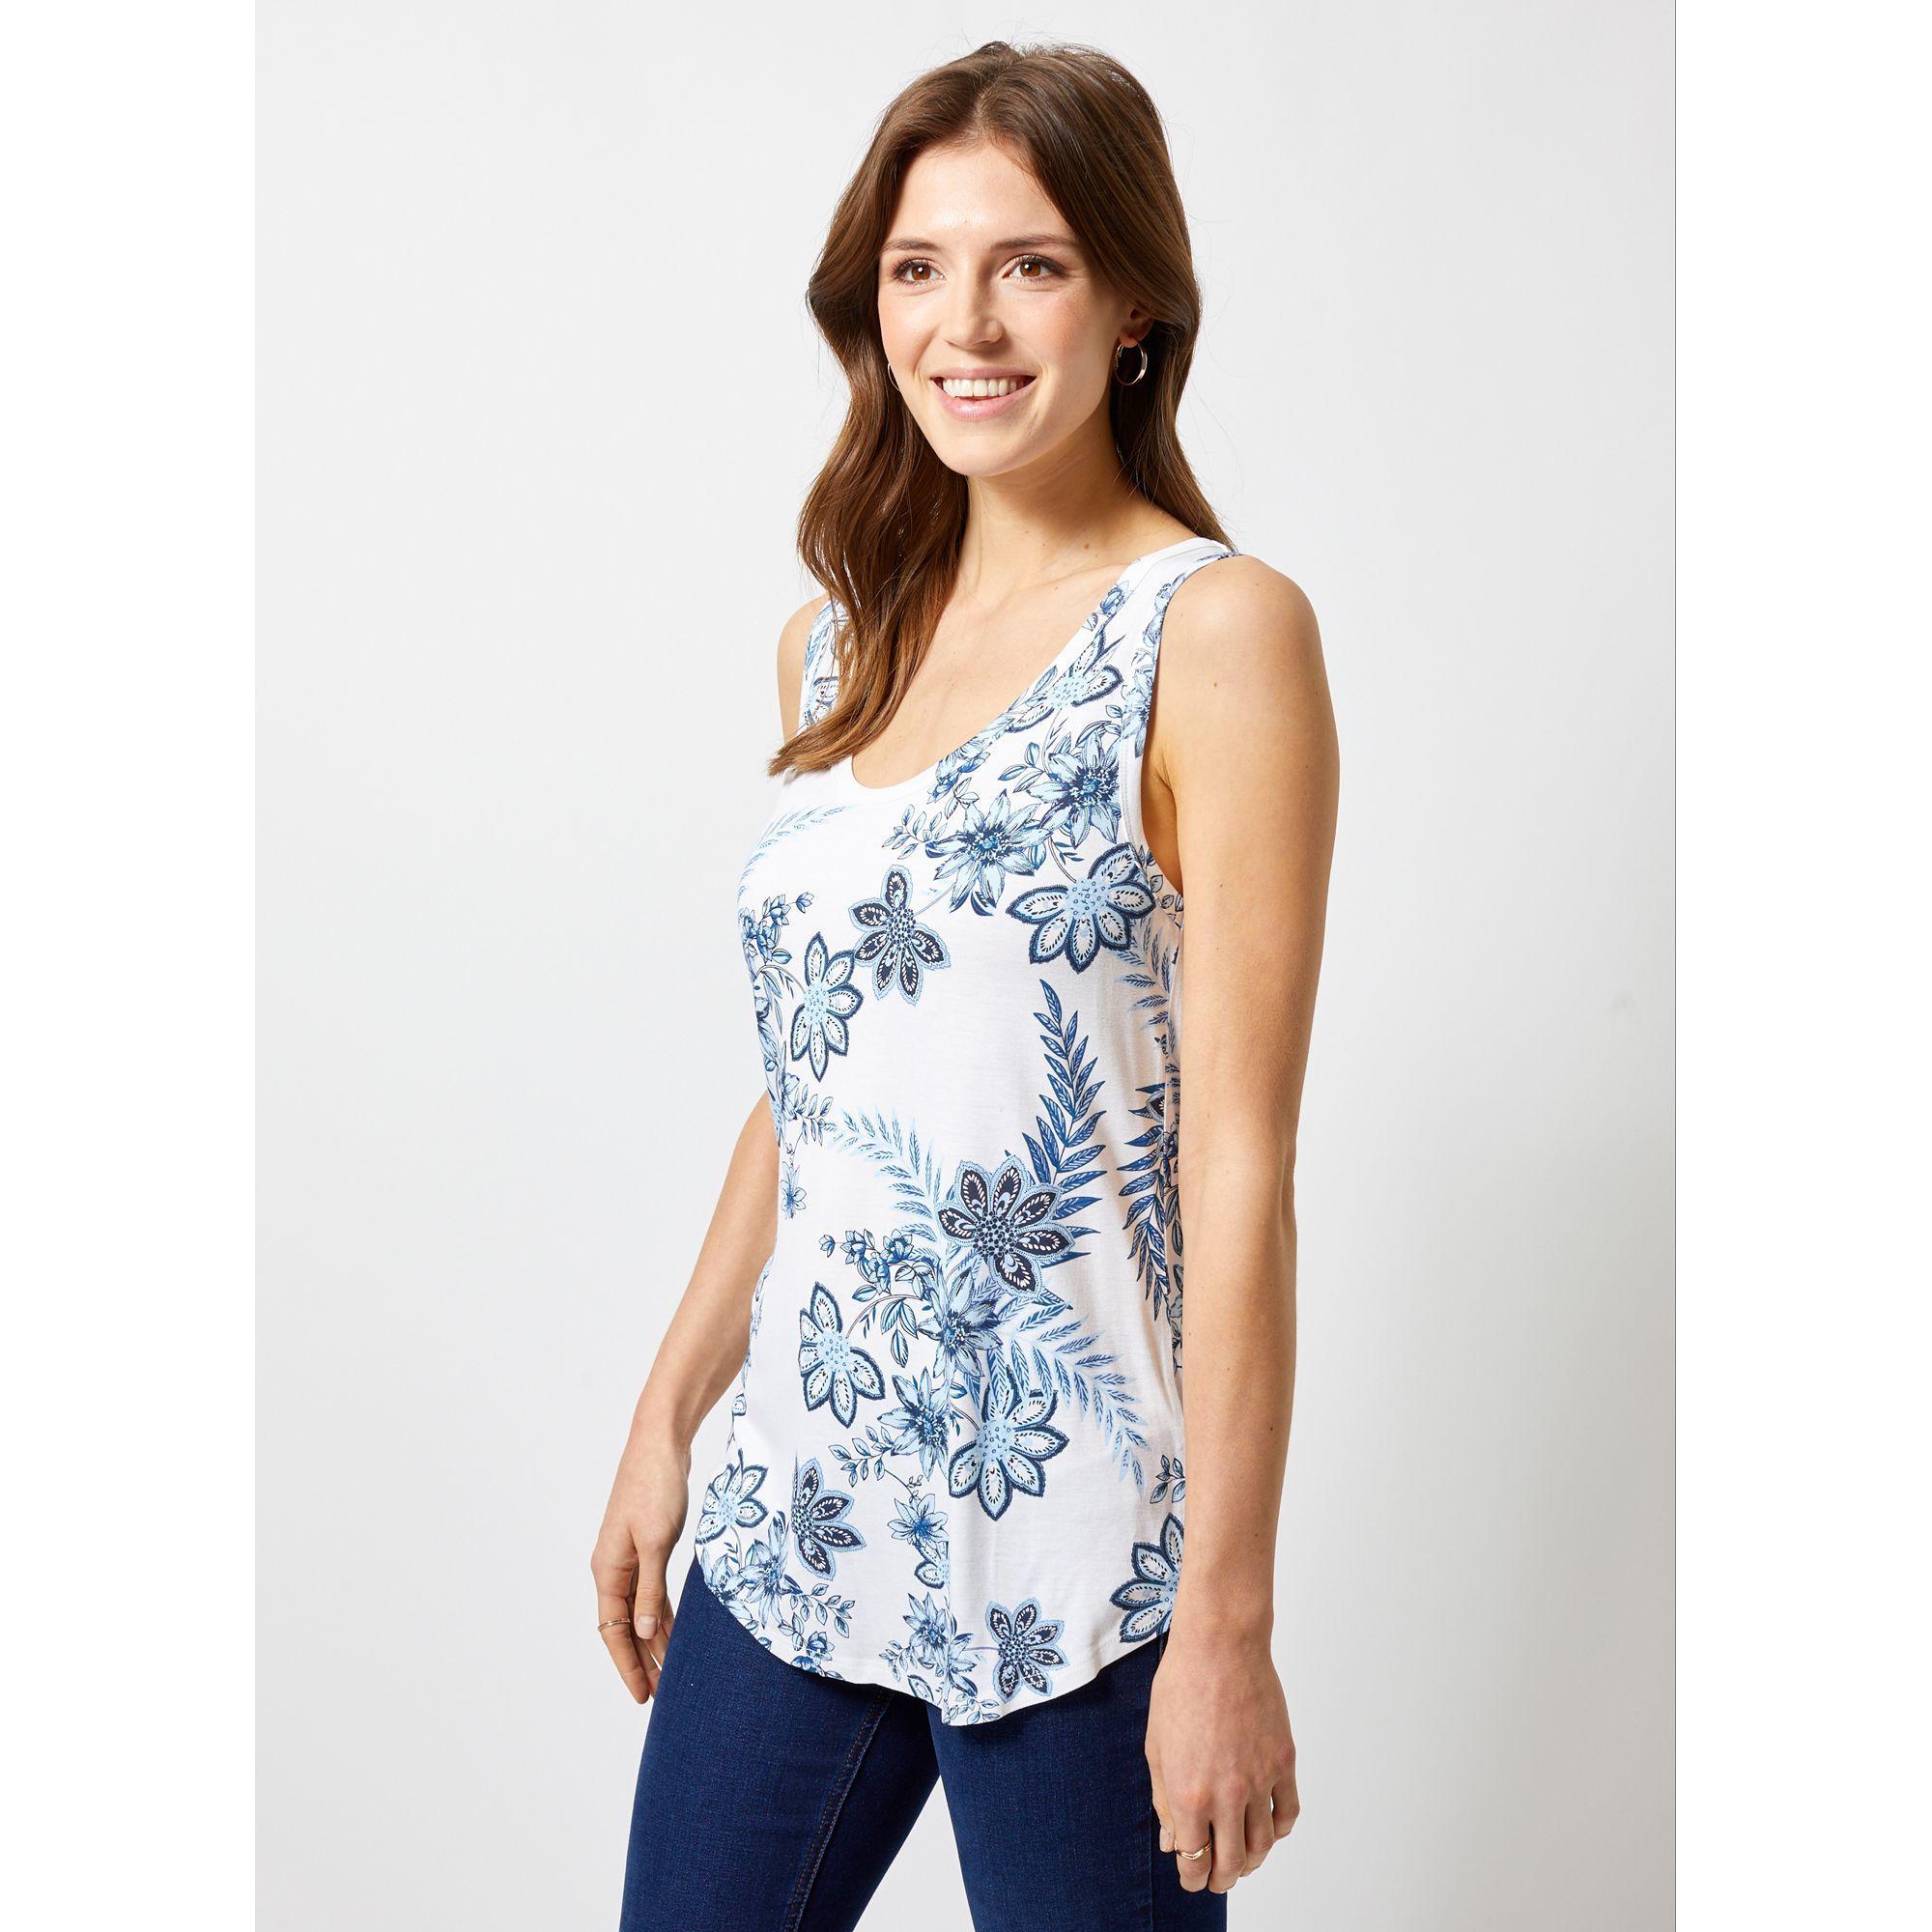 b260467c67d94 Dorothy Perkins Ivory Floral Print Viscose Vest in White - Save 17 ...